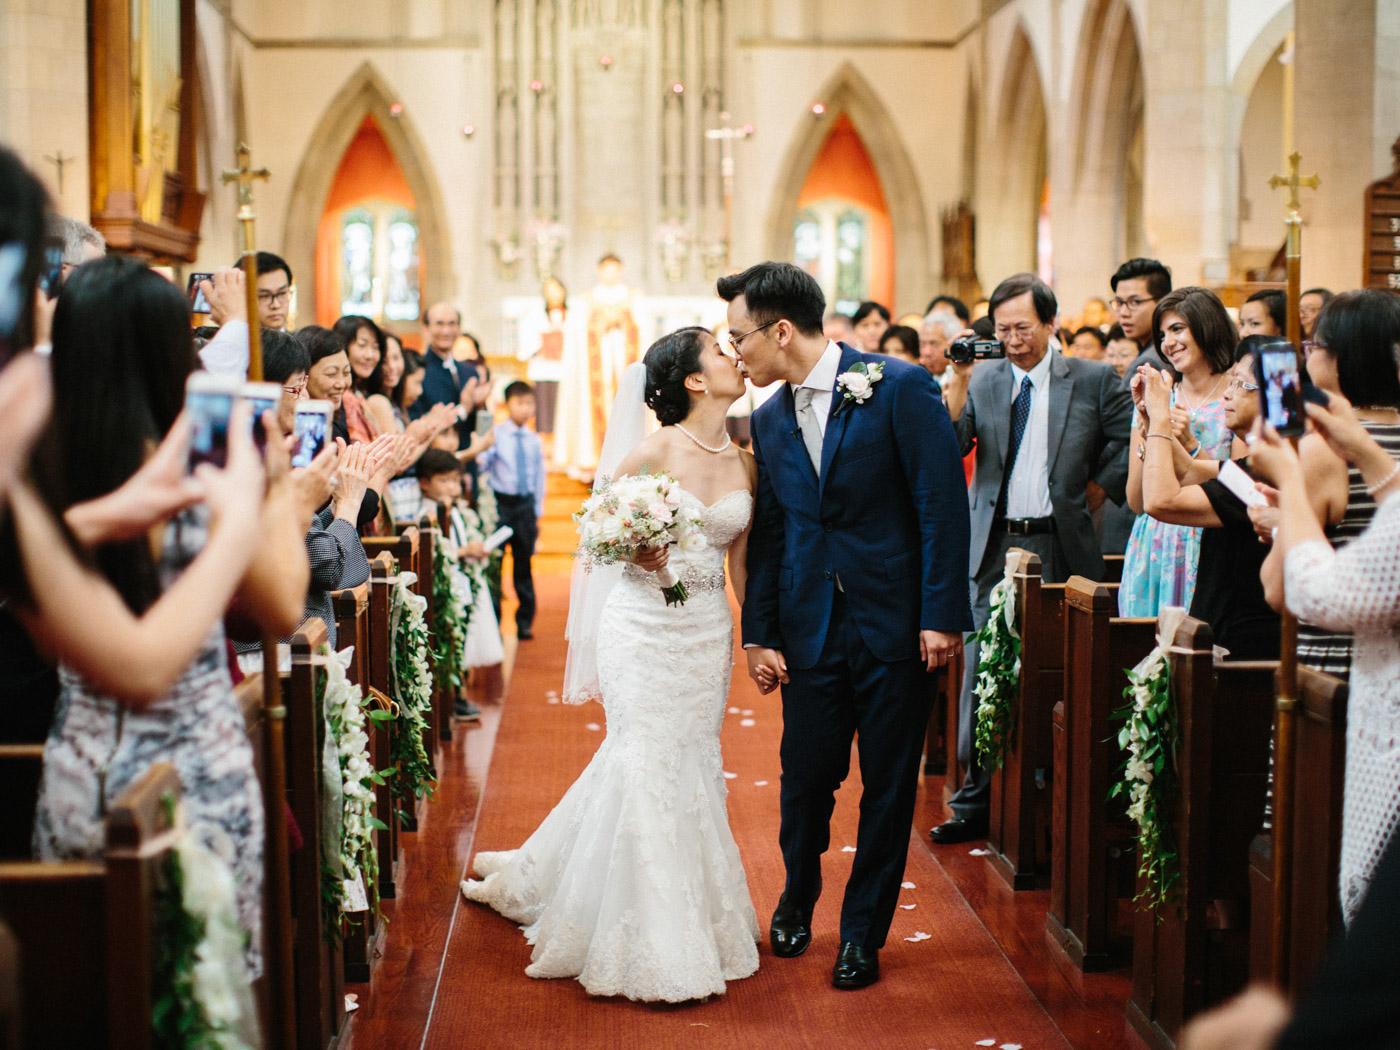 toronto_wedding_photographer_fine_art_documentary_photography-70.jpg